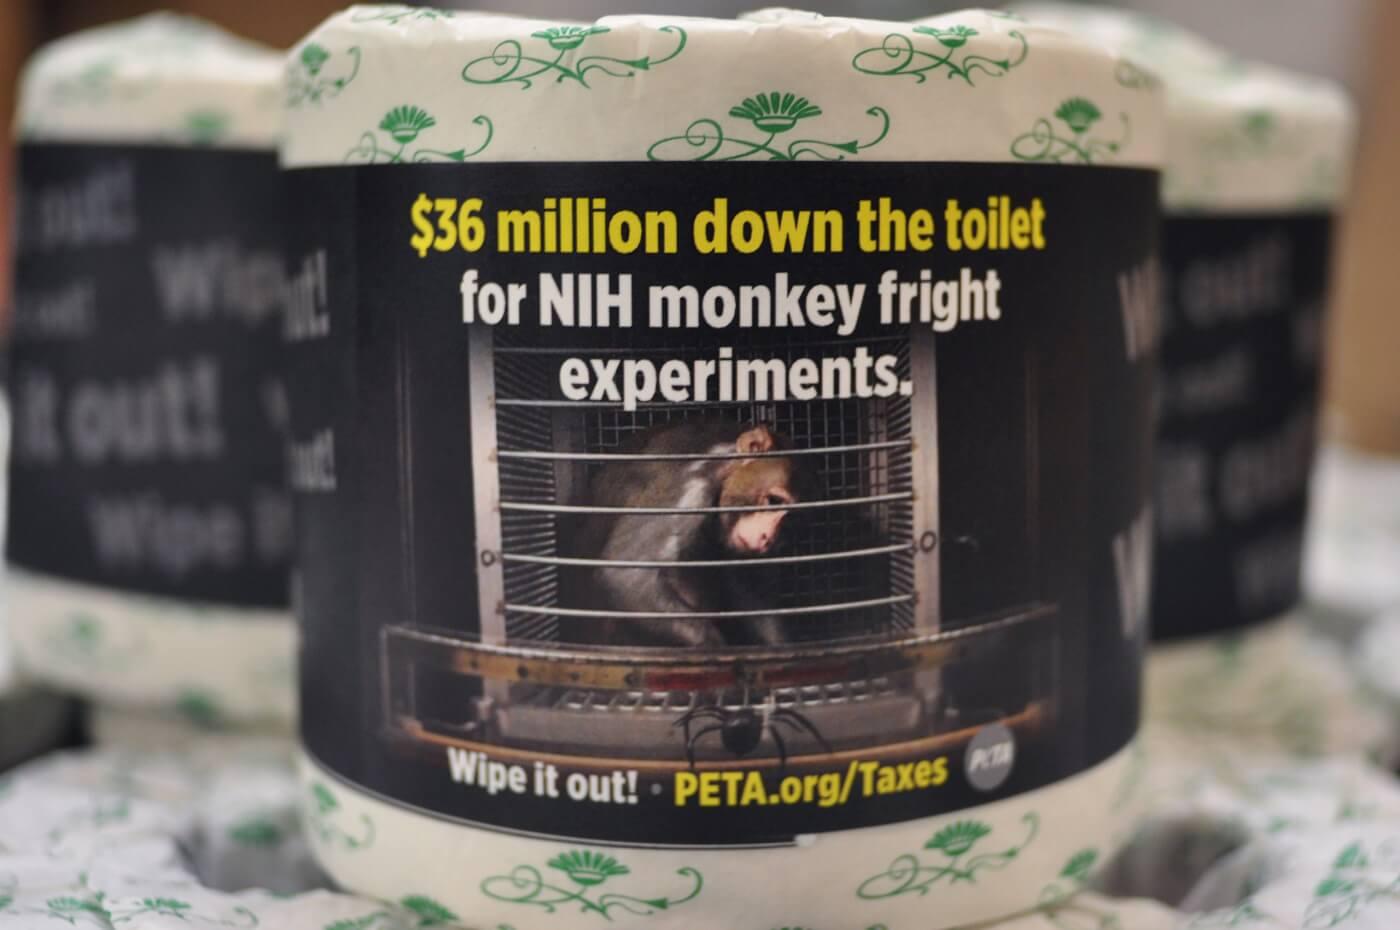 PETA Toilet Paper for congress up close 1 roll